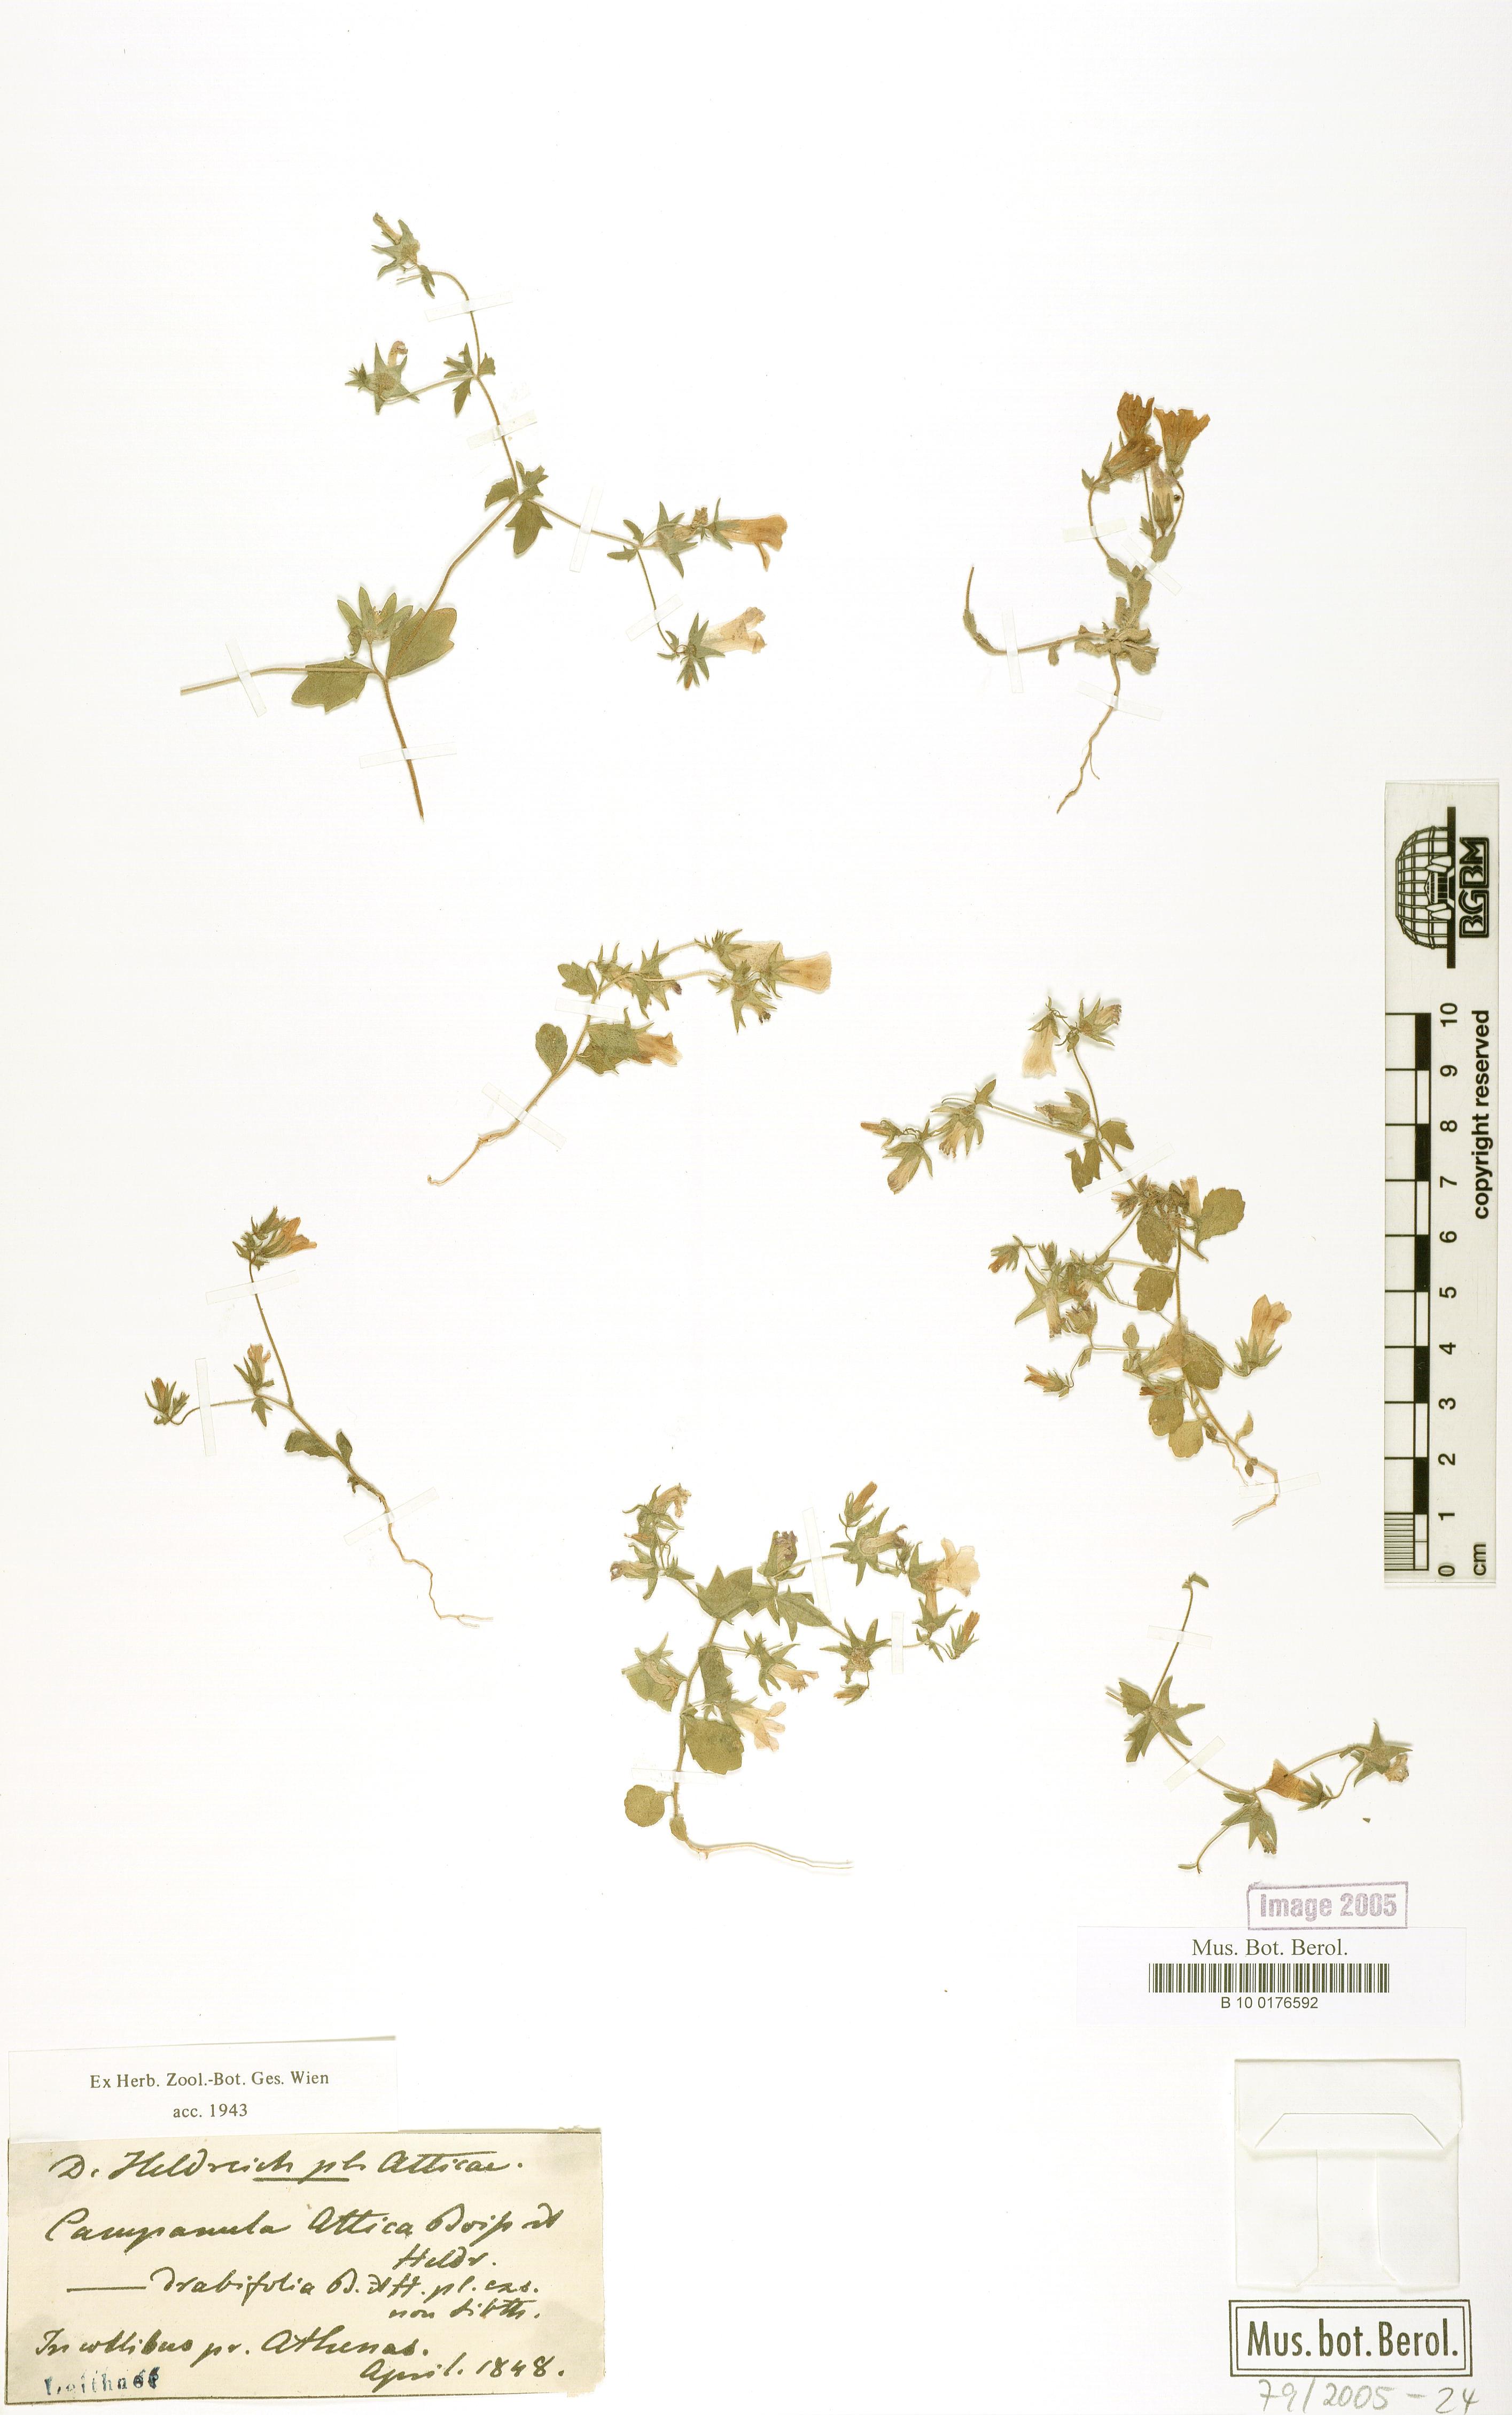 http://ww2.bgbm.org/herbarium/images/B/10/01/76/59/B_10_0176592.jpg